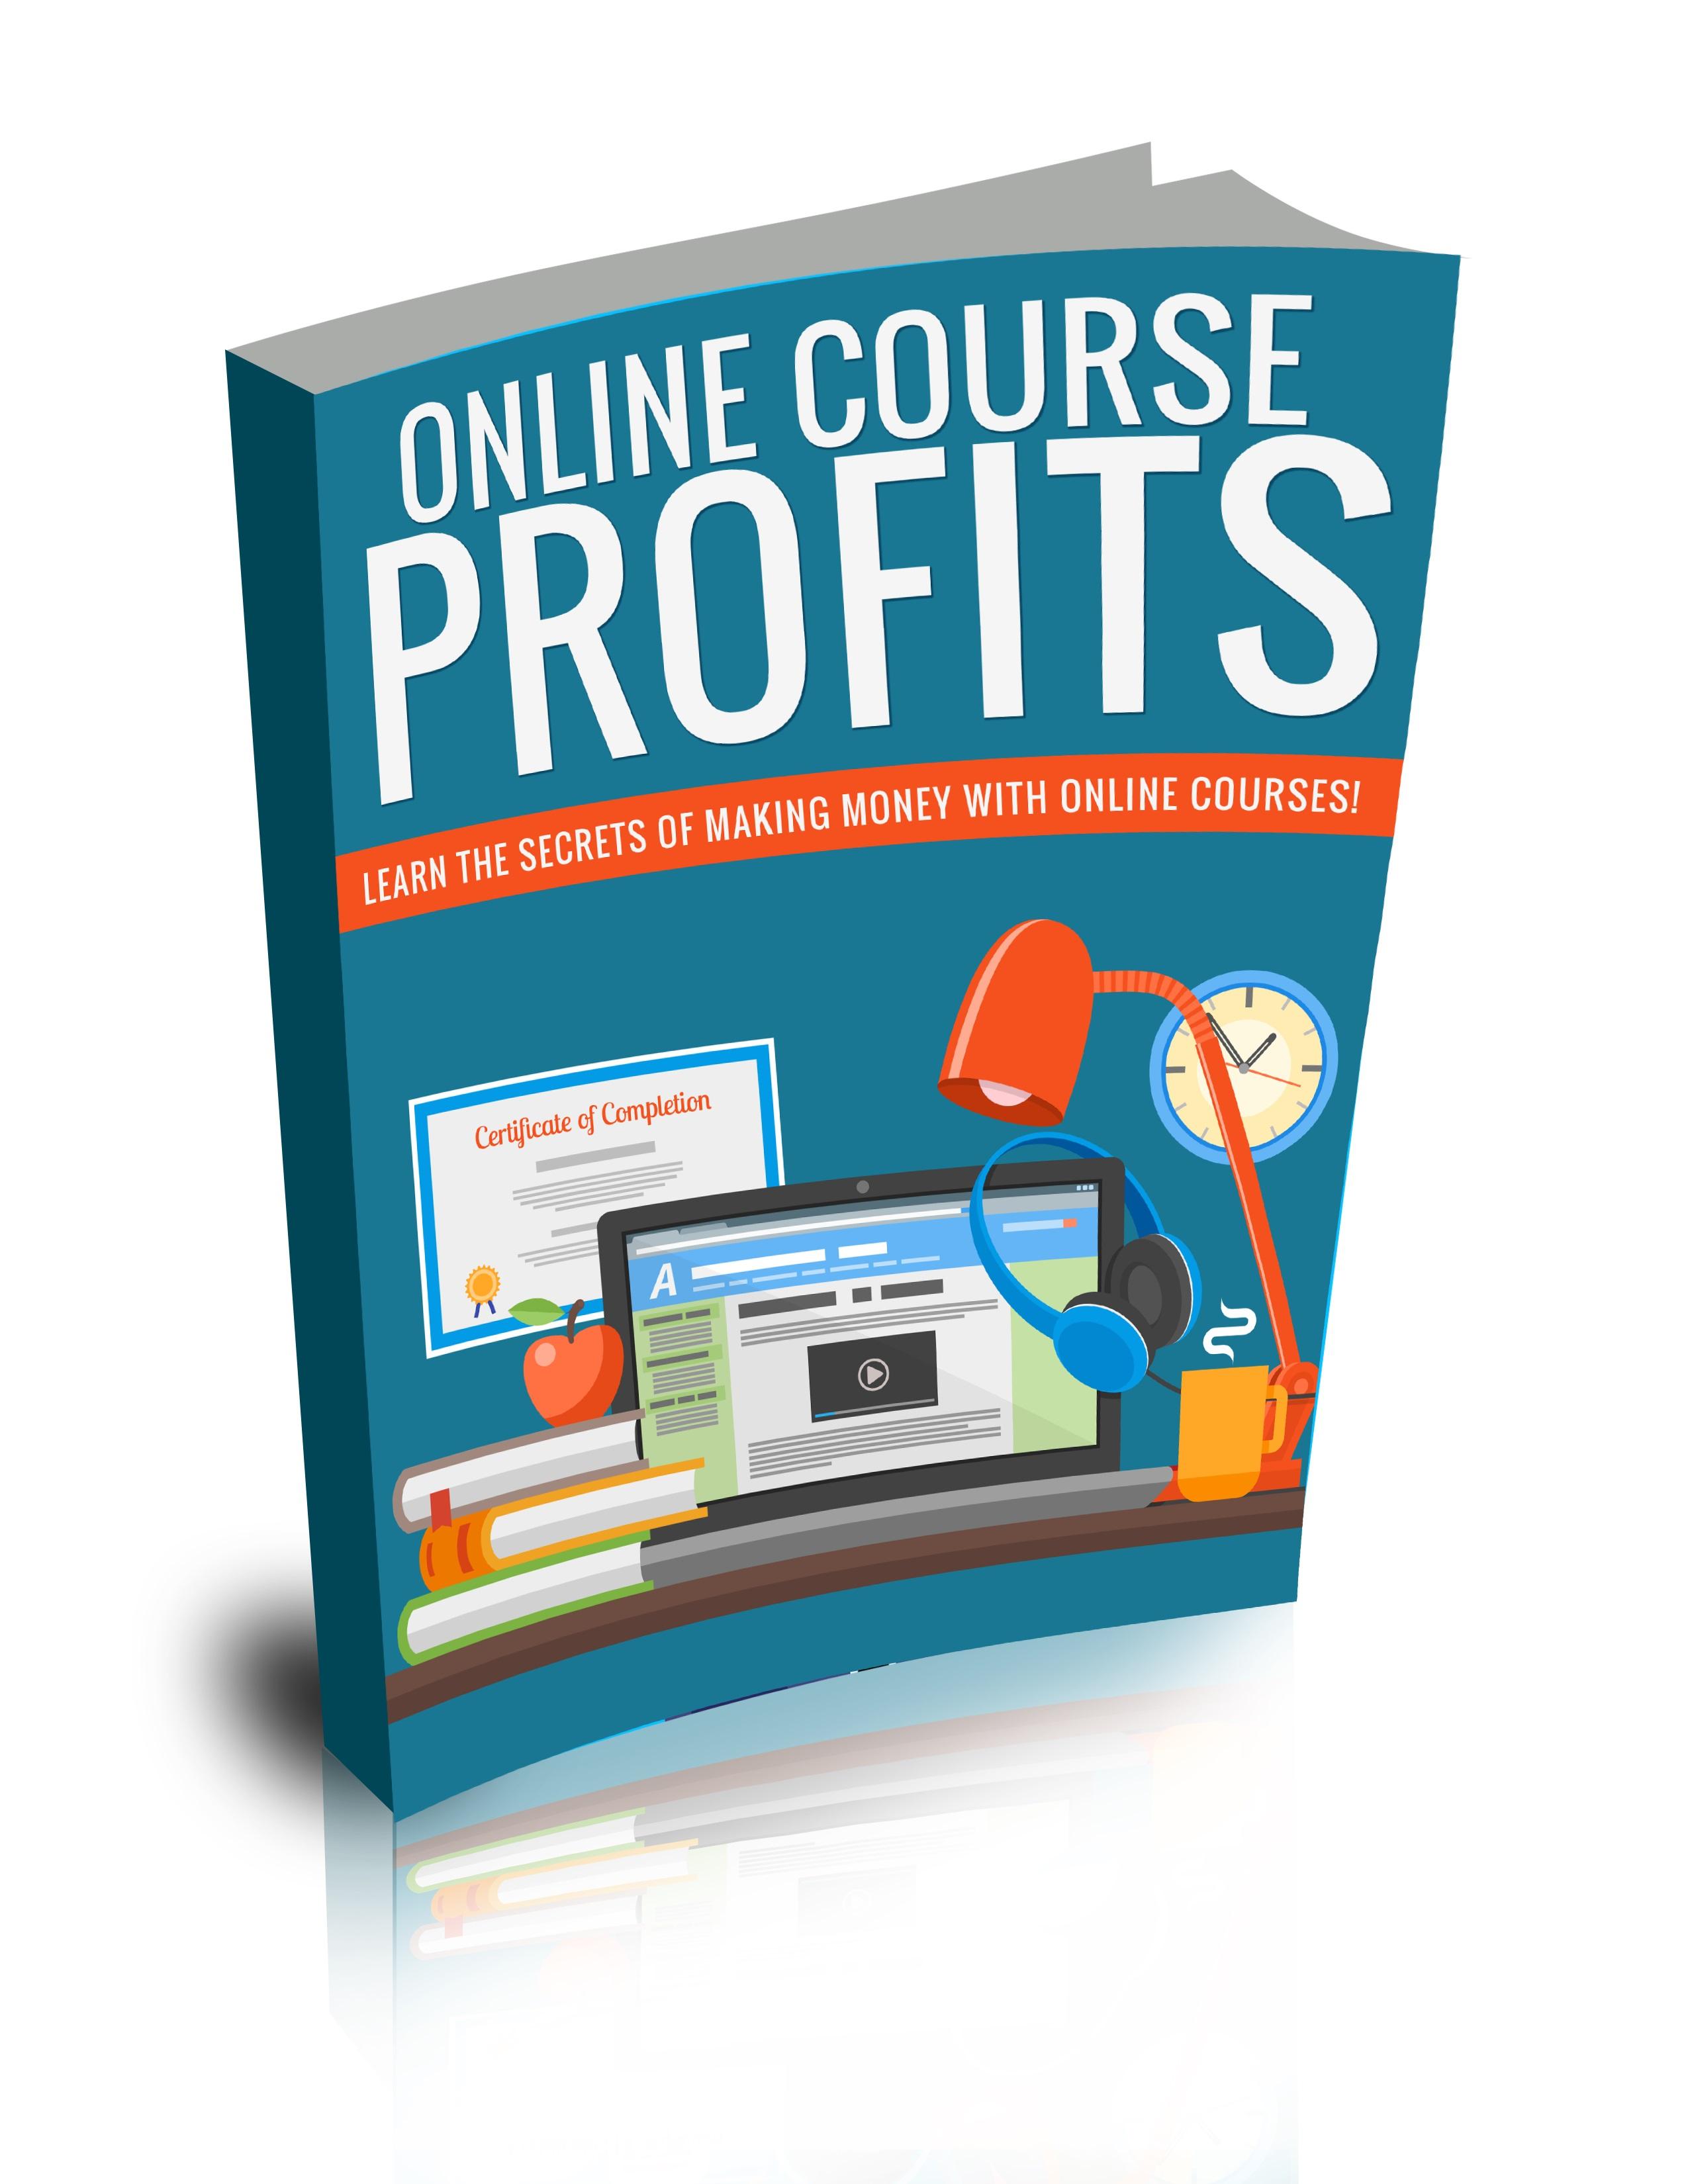 Online Course Profits Package